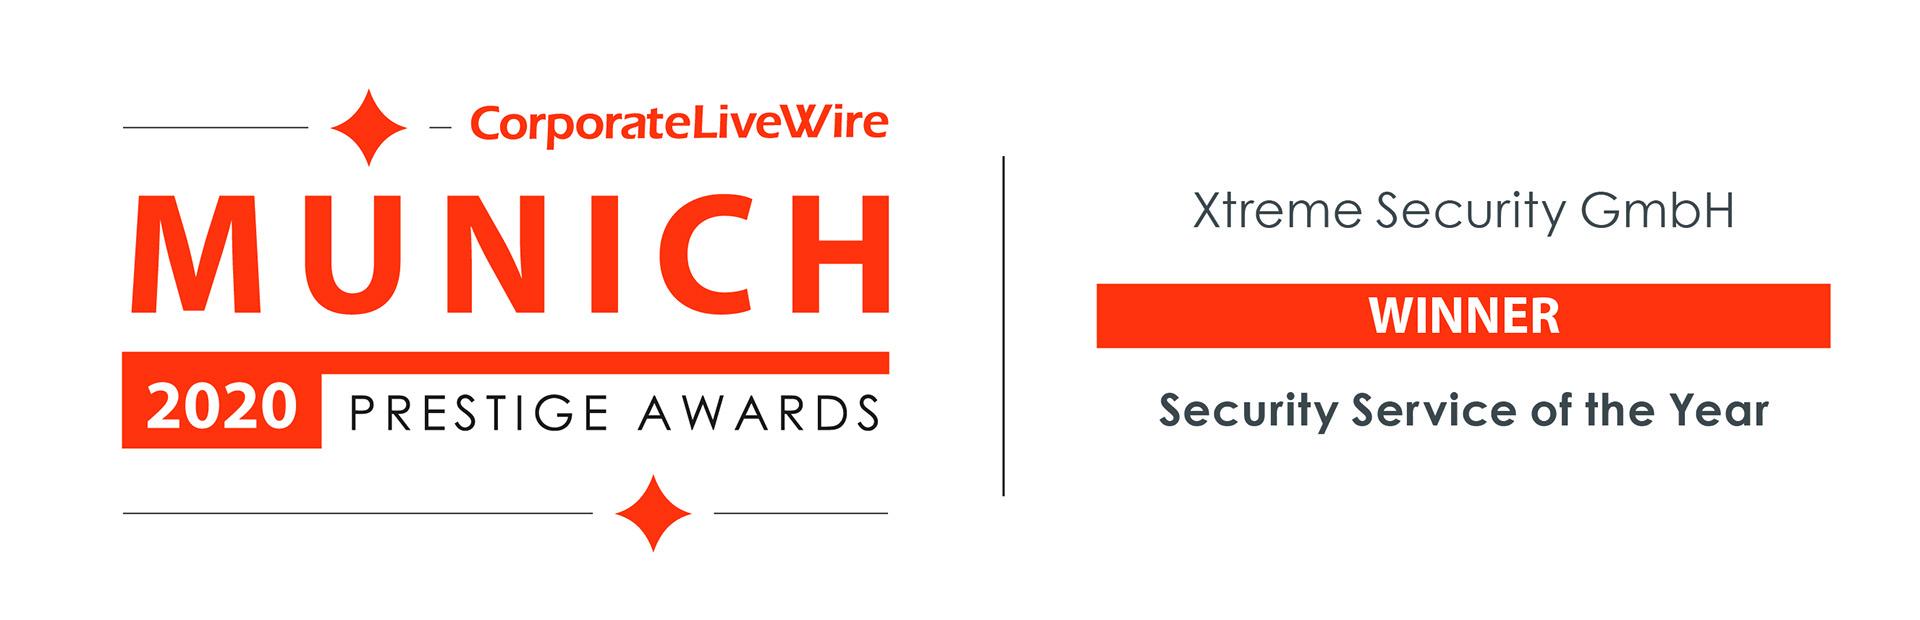 Xtreme-Security-GmbH-1